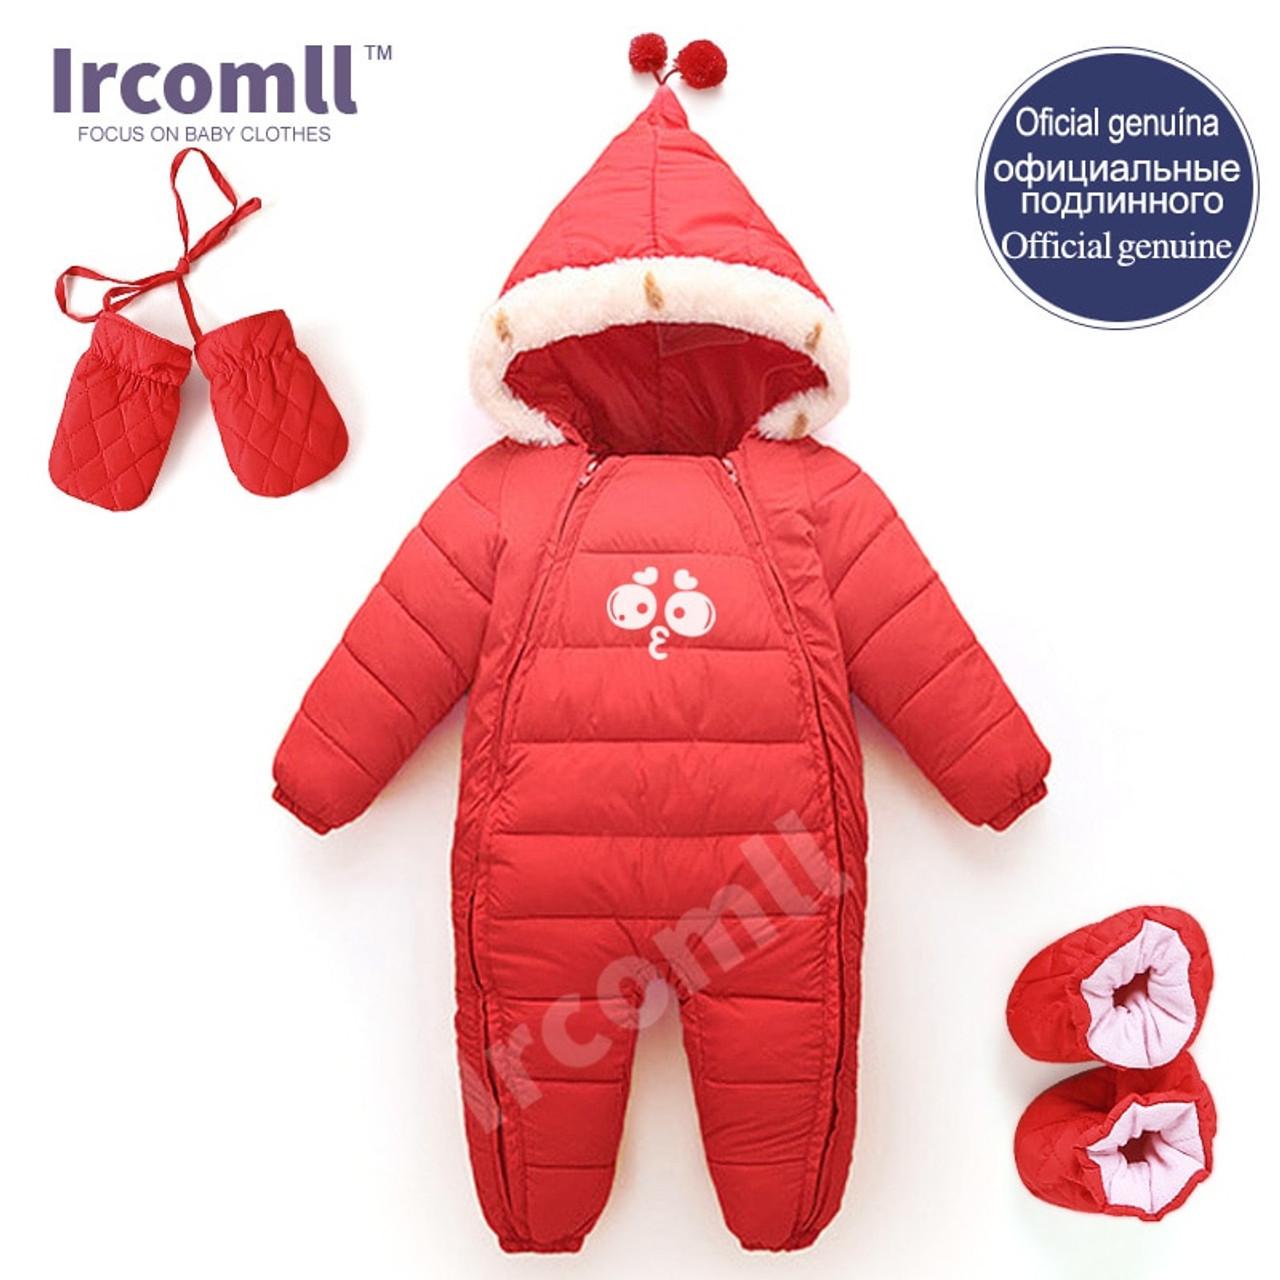 e790ae2d3ec4 ... Down Cotton Baby Rompers Winter Thick Boys Costume Girls Warm Infant  Snowsuit Kid Jumpsuit Children Outerwear ...